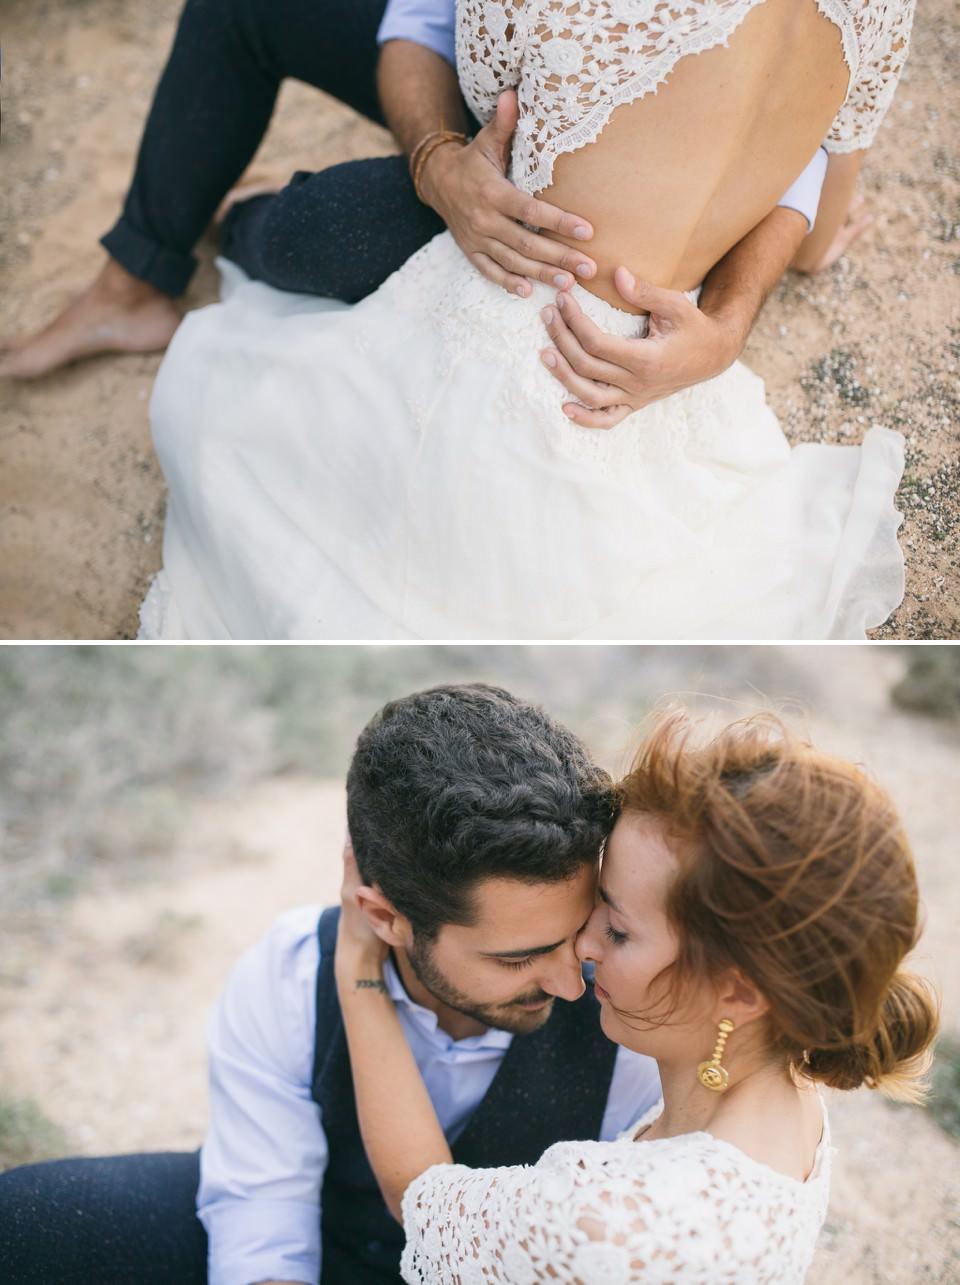 FORMA Photography | Fotograf Elopement und Intime Hochzeiten | Wedding photographer elopements and intimate weddings